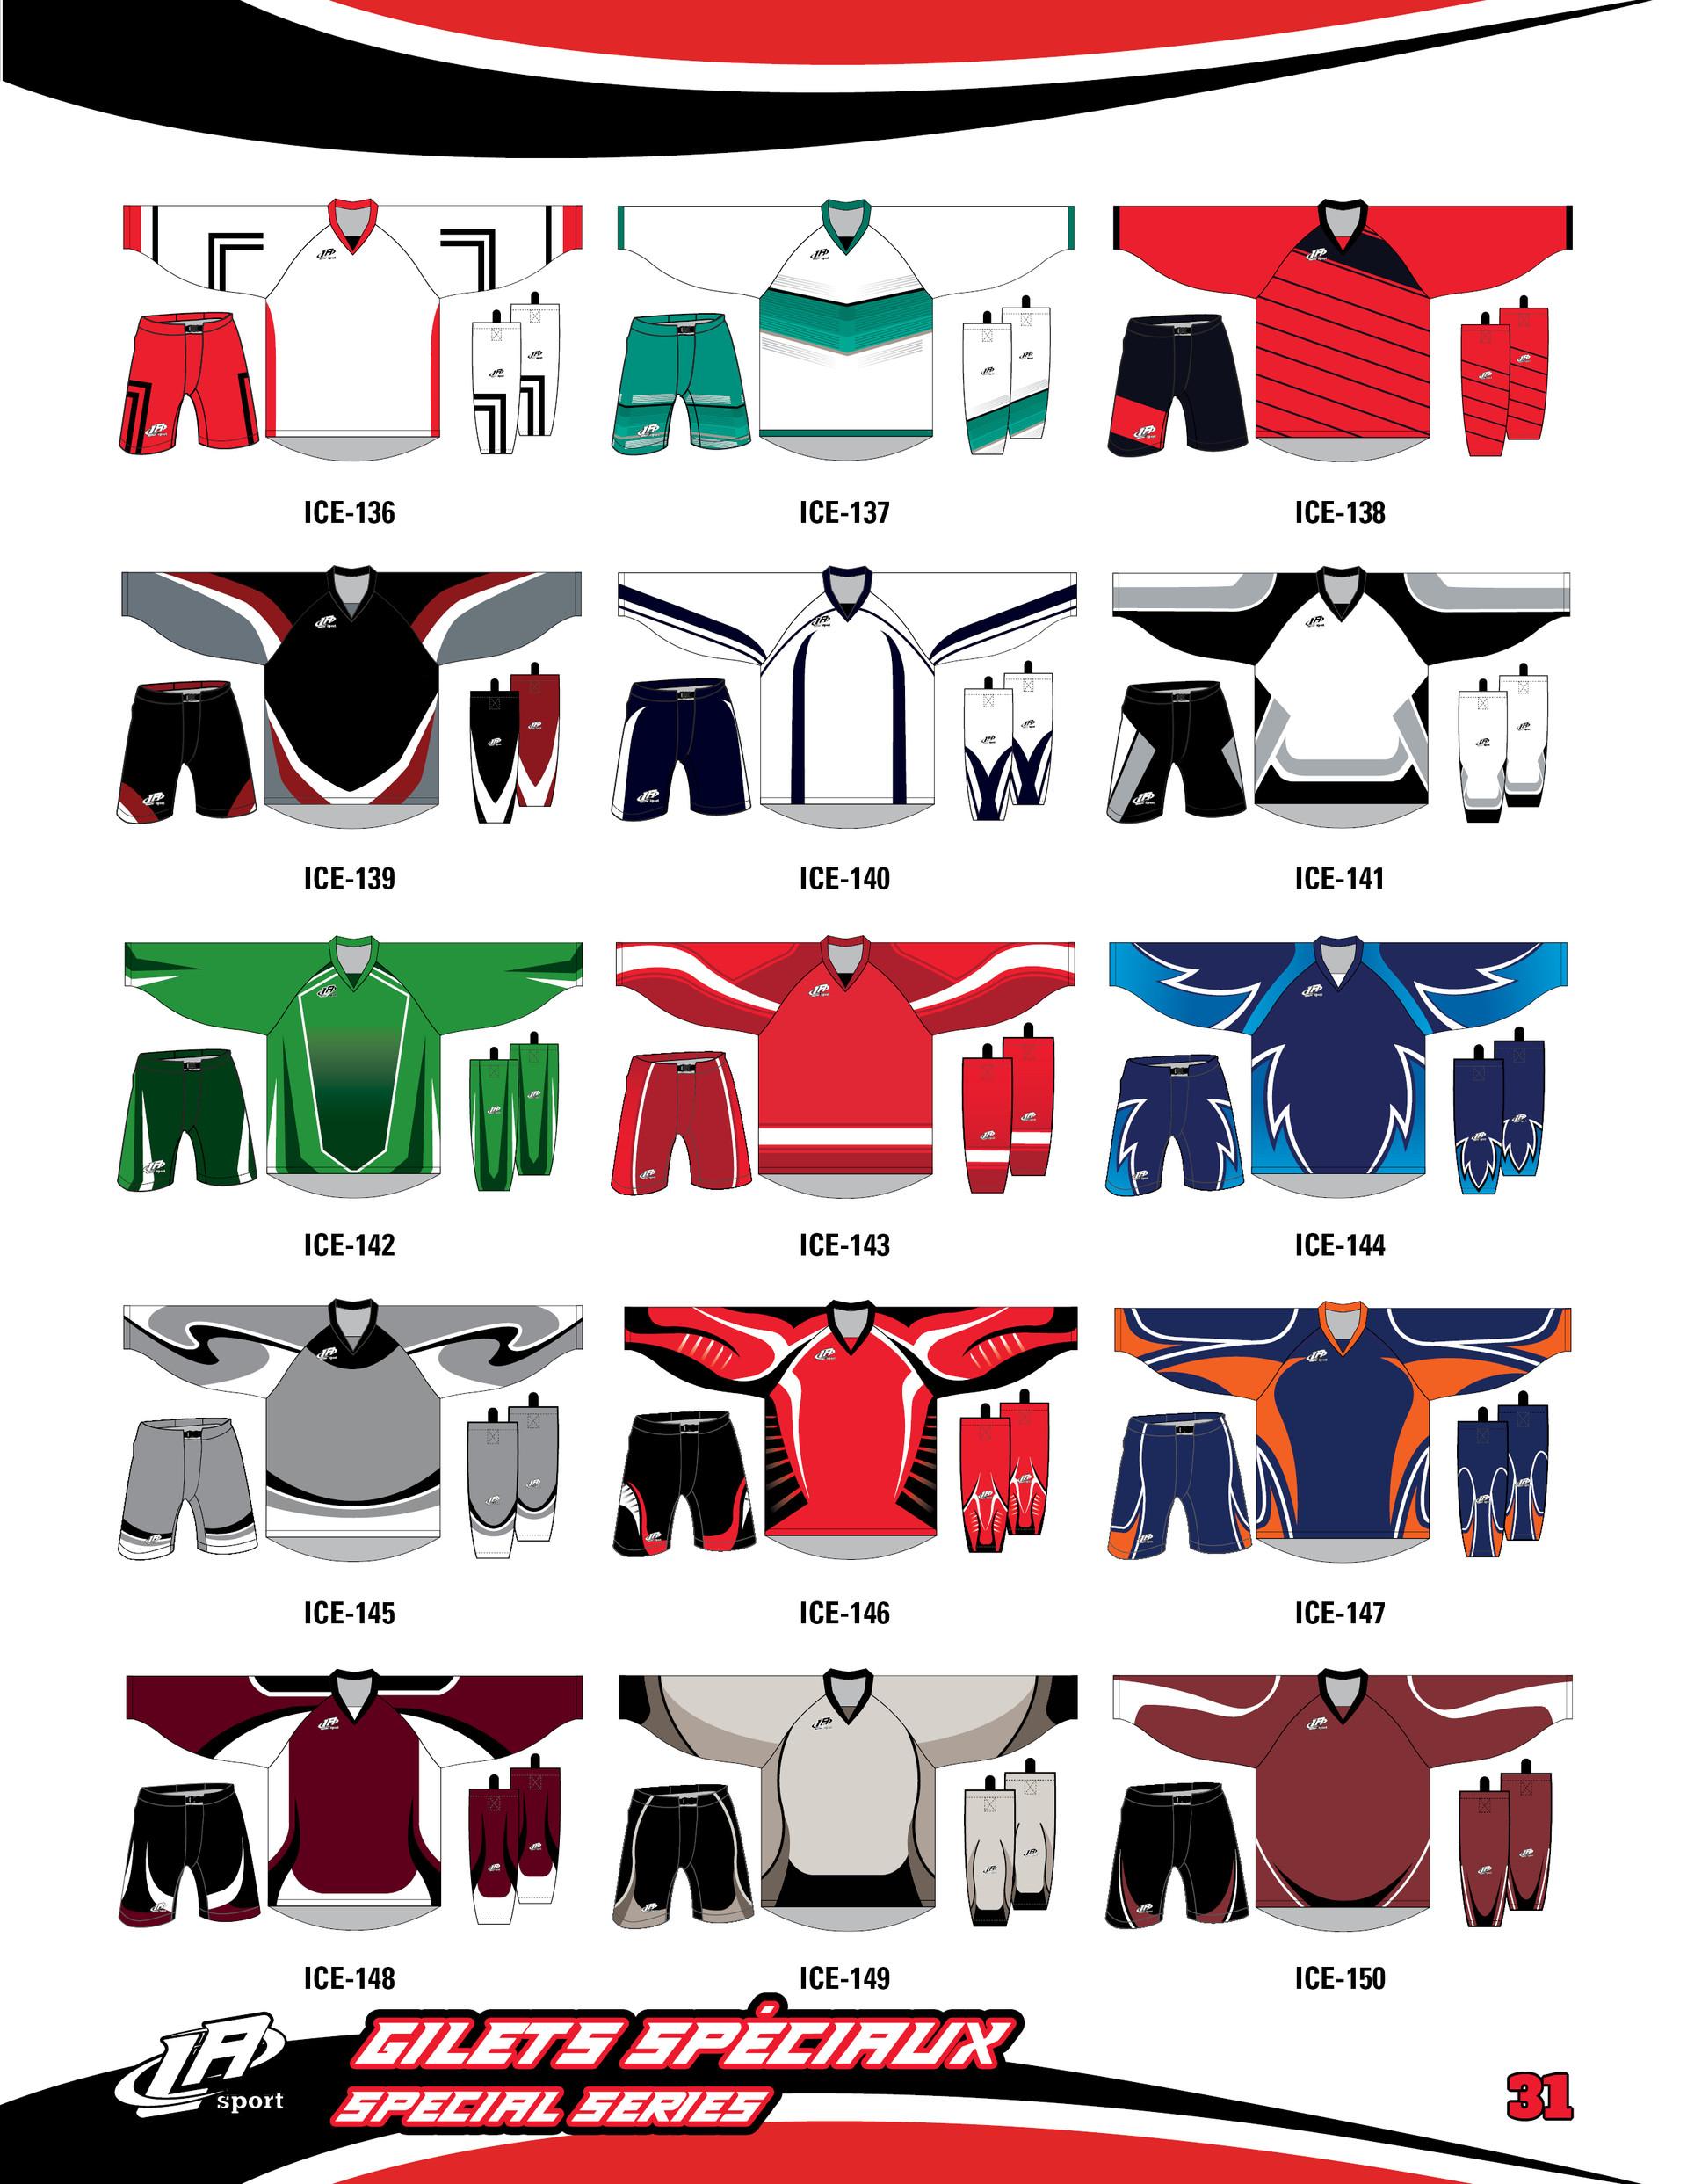 Hockey-Catalogue2018-RGB-screen31.jpg